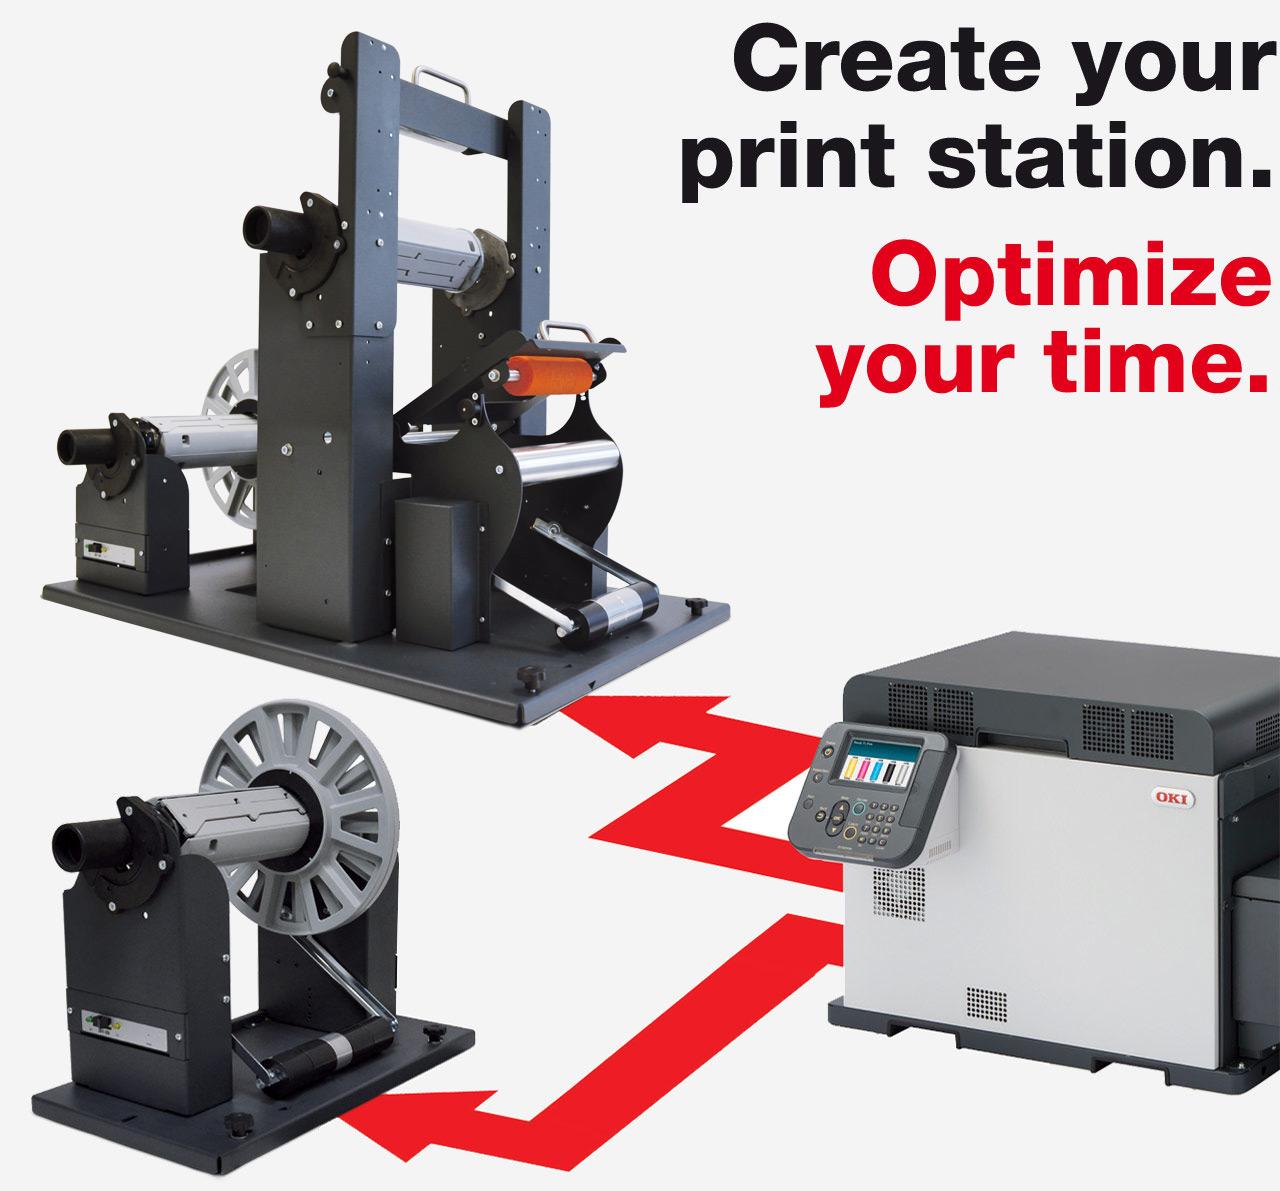 Label Accessories for OKI Pro Series Printers (Pro1050